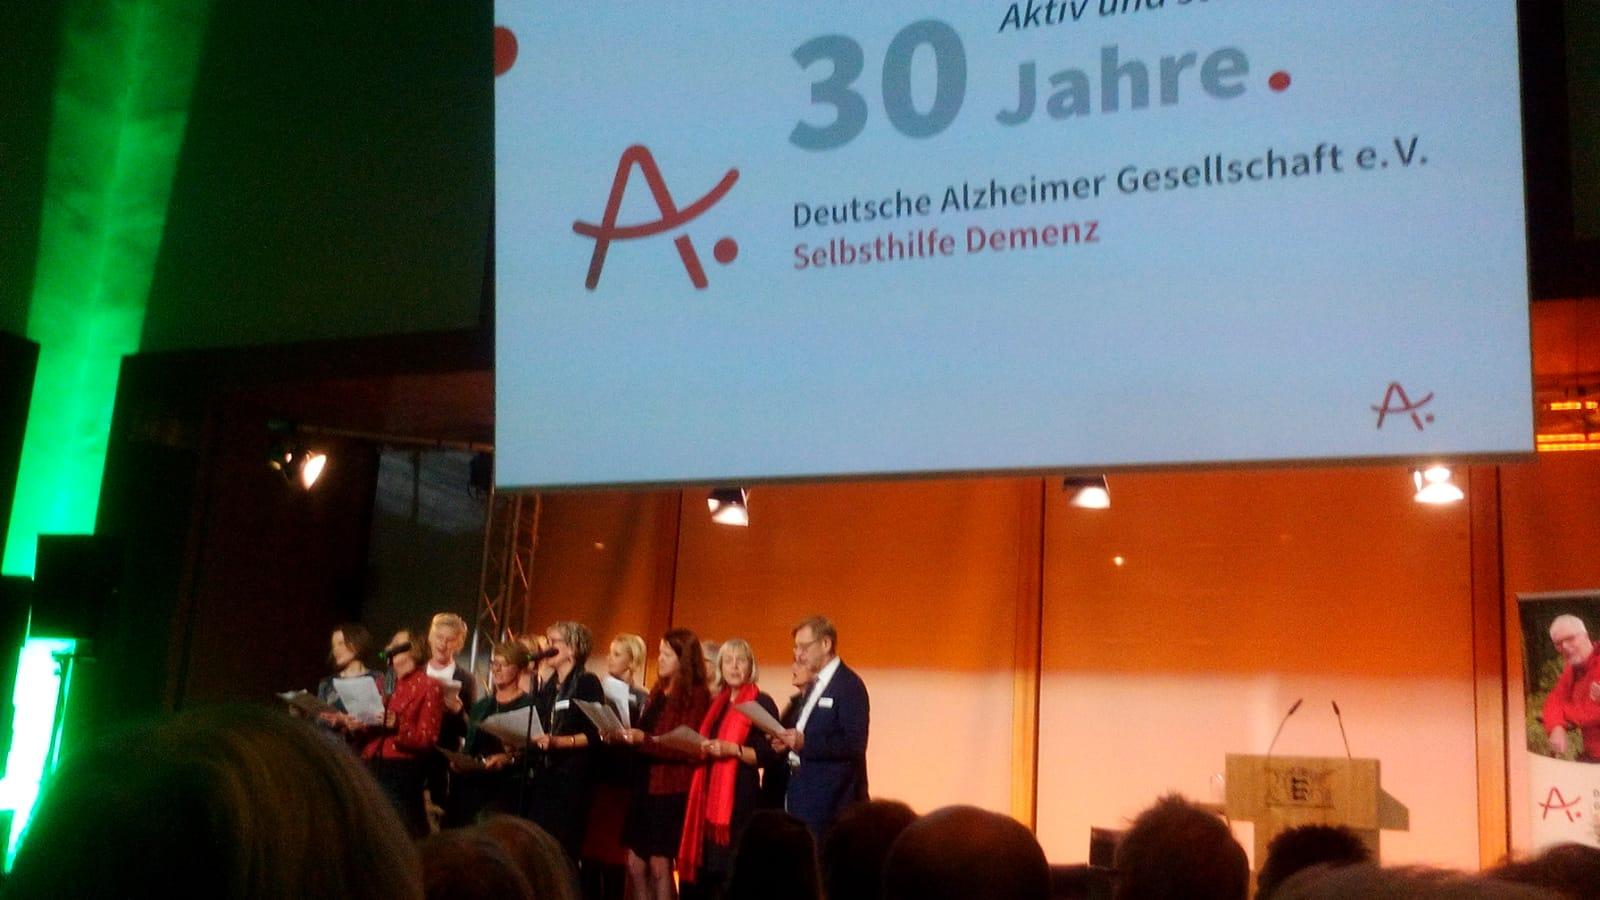 Jubiläumsveranstaltung Zum 30-Jährigen Bestehen Der Deutschen Alzheimer Gesellschaft E.V.